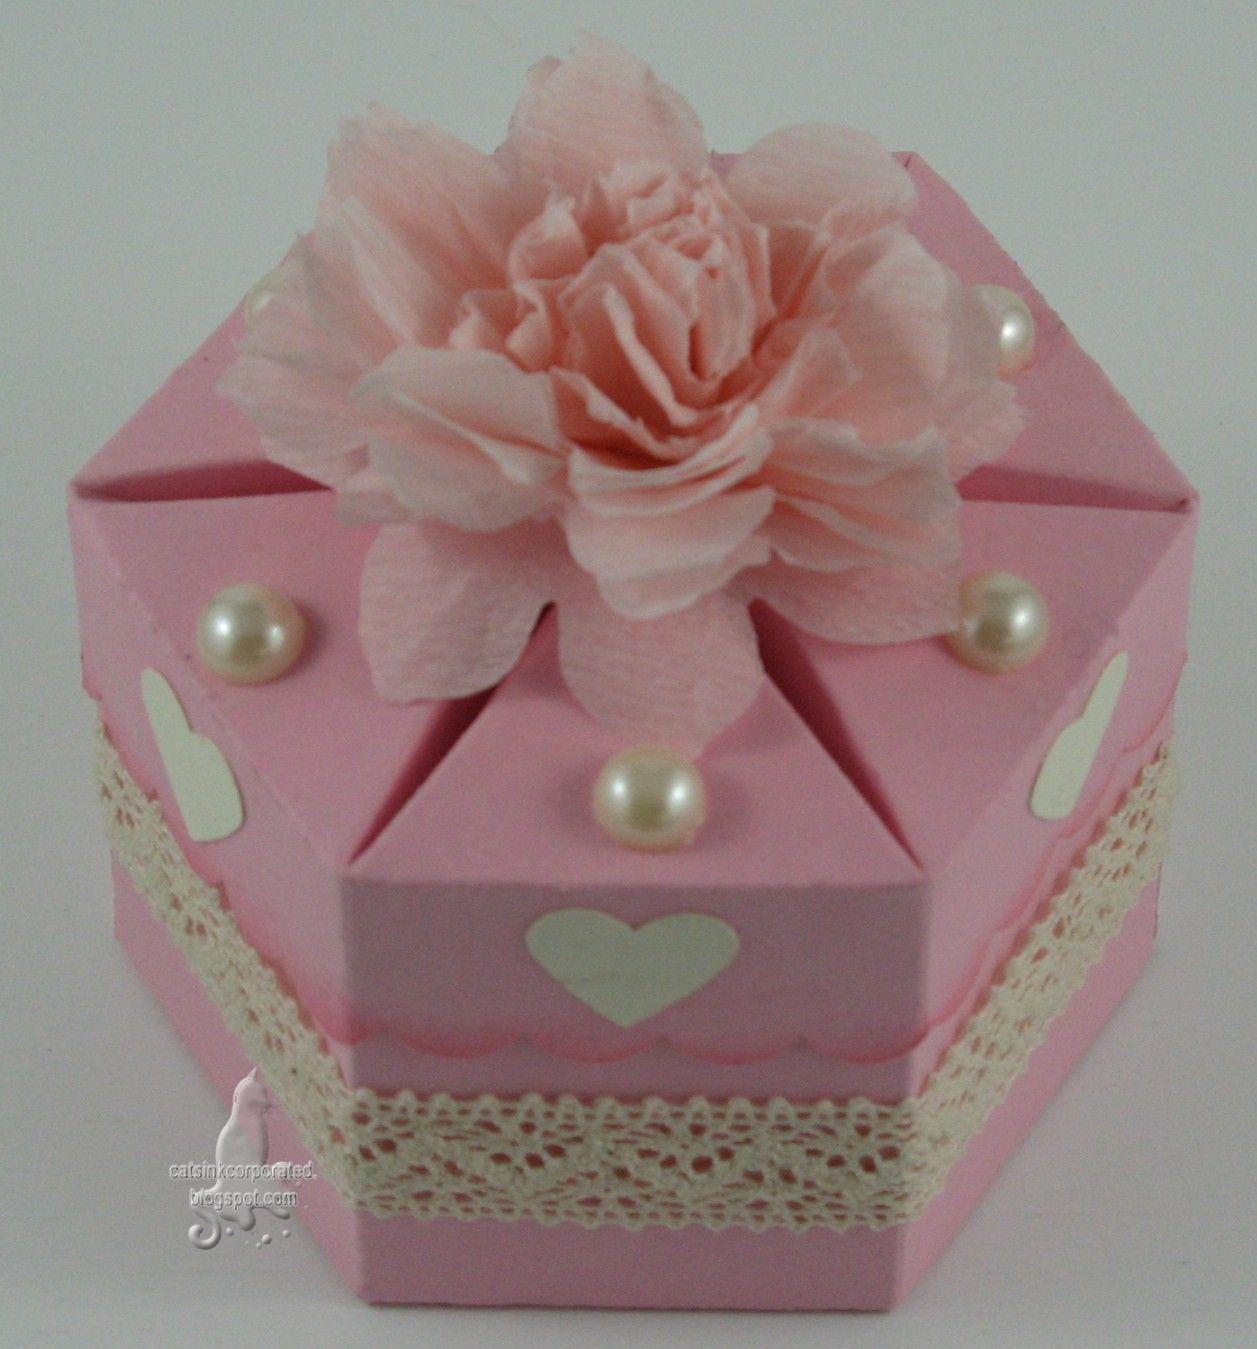 http://1.bp.blogspot.com/-r-x9i5_2Vkc/Tl3u0NOHh6I/AAAAAAAAB1A/9qPEamYuwtI/s1600/Stamperoos+Stamp+Camp+August+2011+-+Pink+Heart+Box.jpg